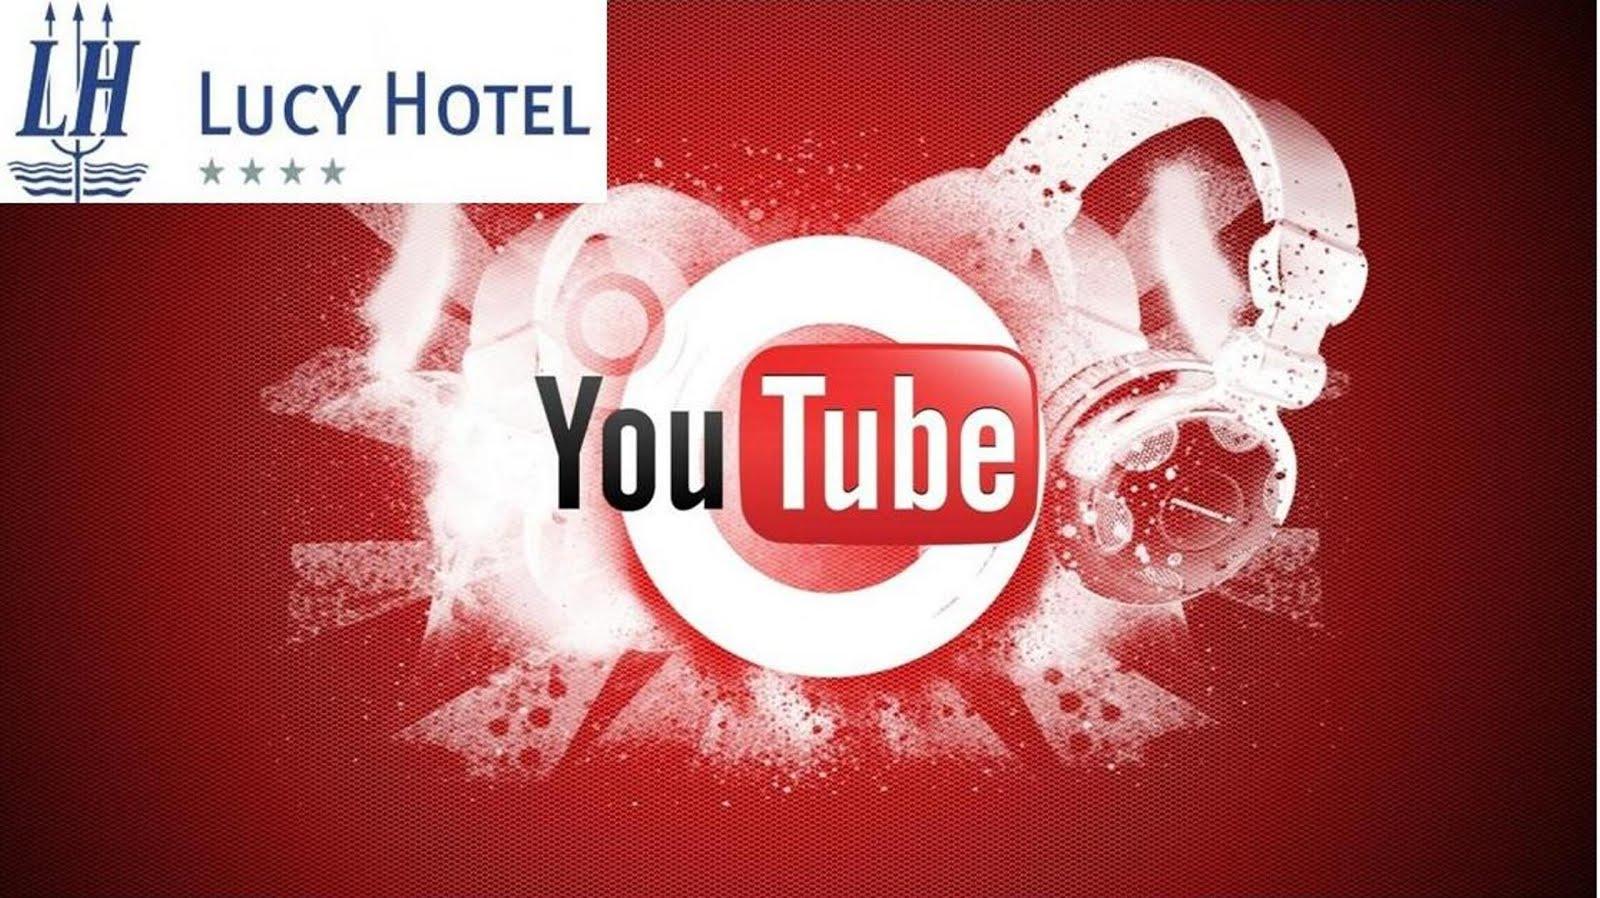 LUCY HOTEL ΣΤΟ YOU TUBE